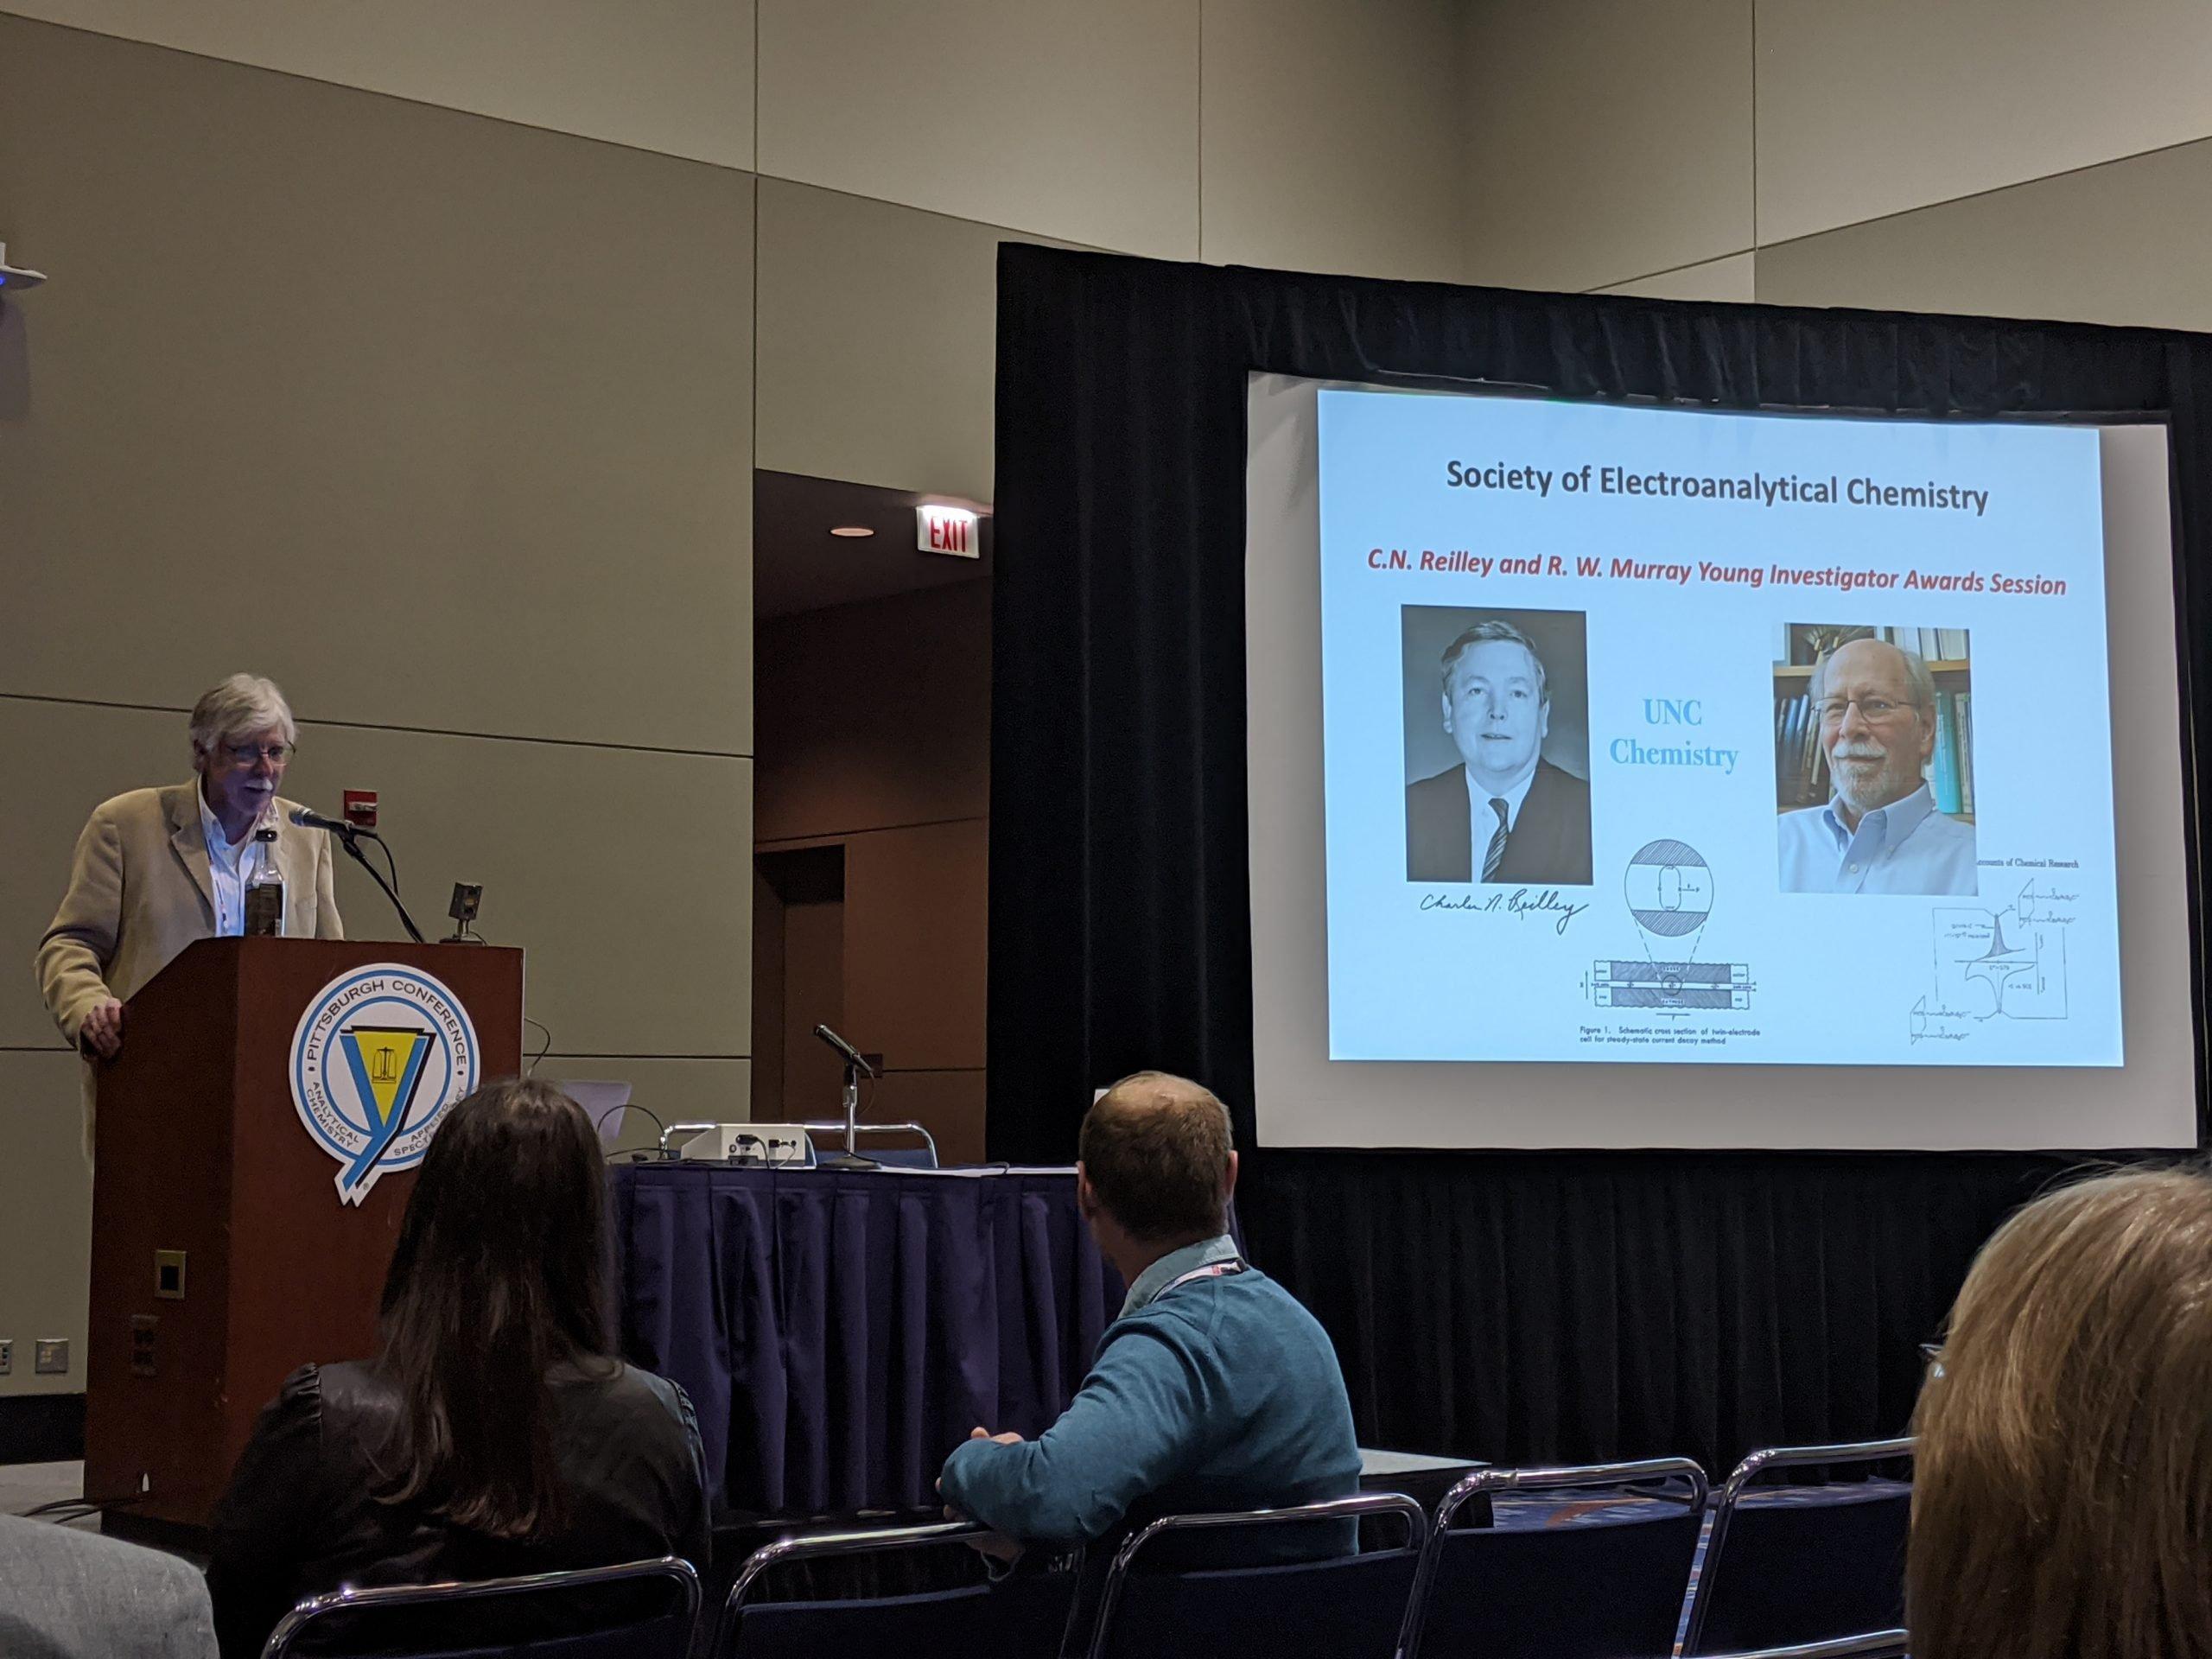 SEAC Award Symposium at Pittcon 2020 (Chicago, IL) – 10